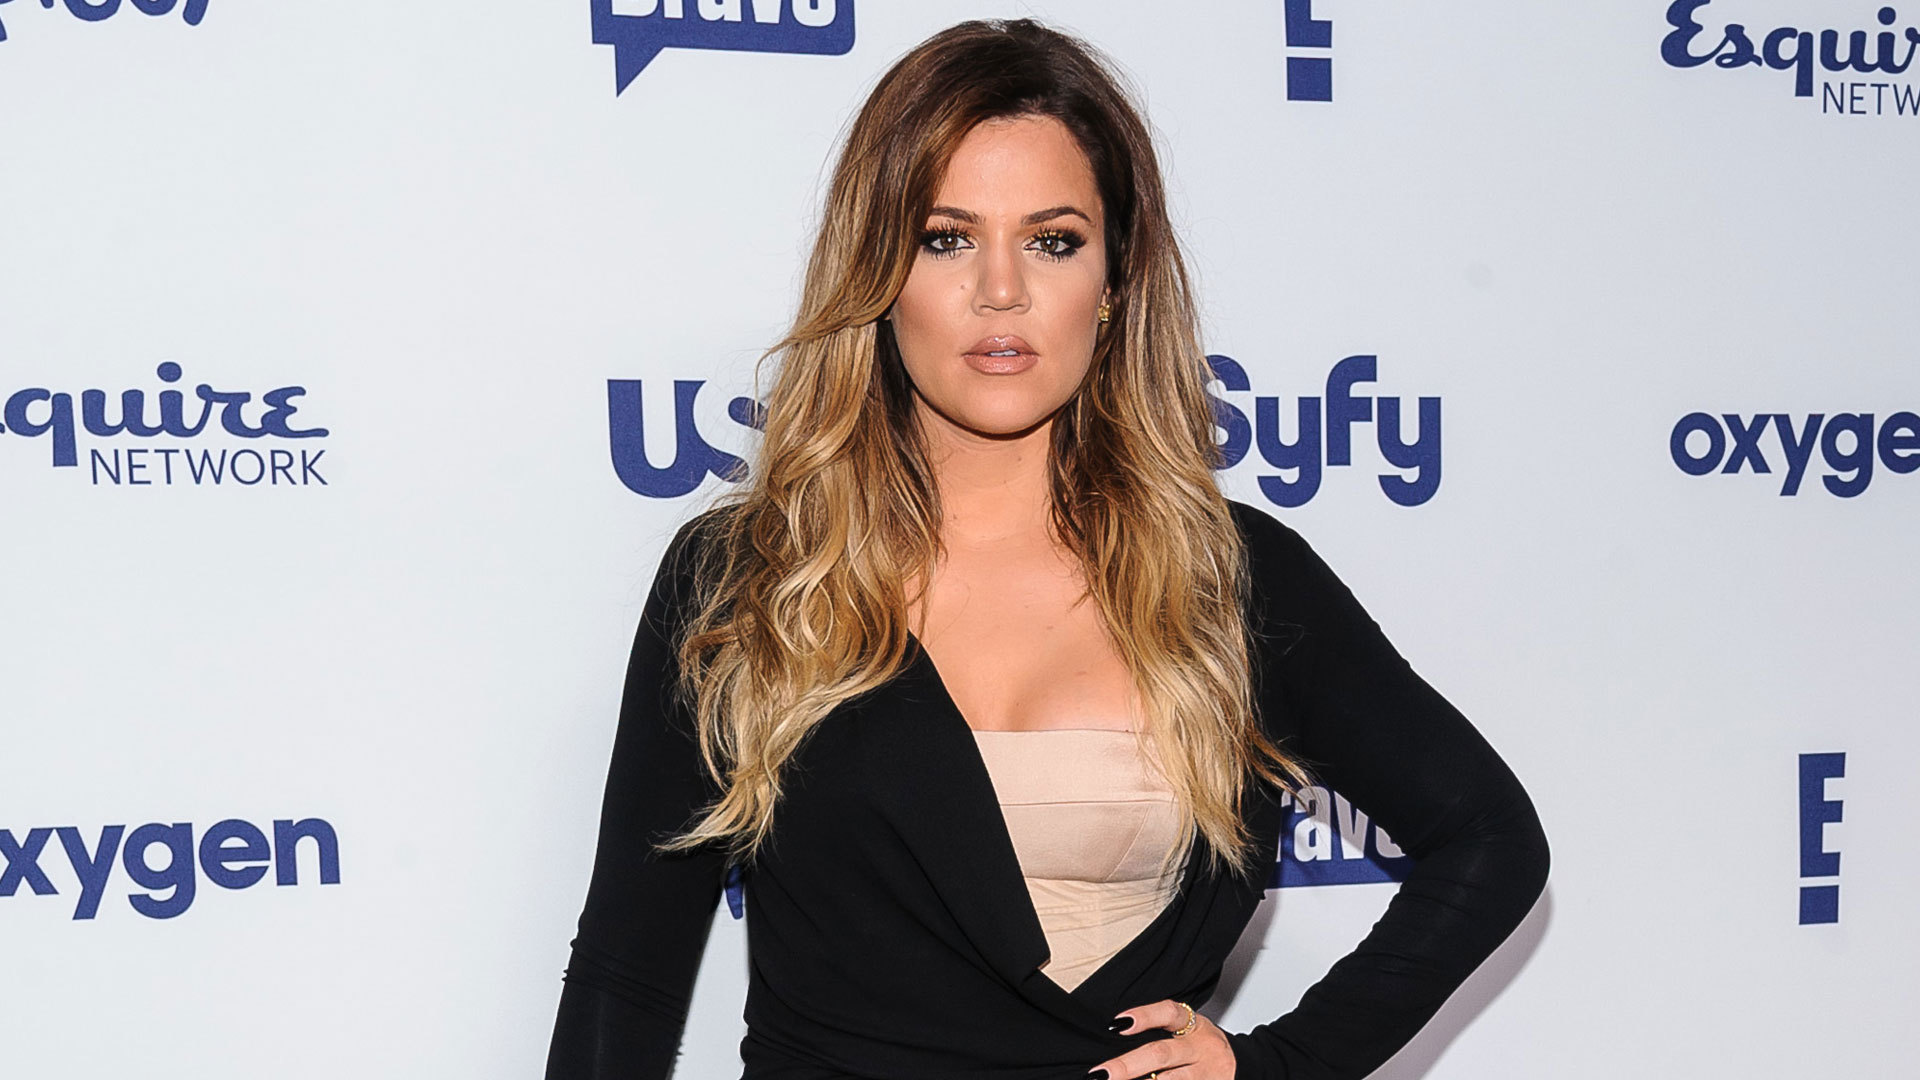 Khloe Kardashian High Definition Wallpapers